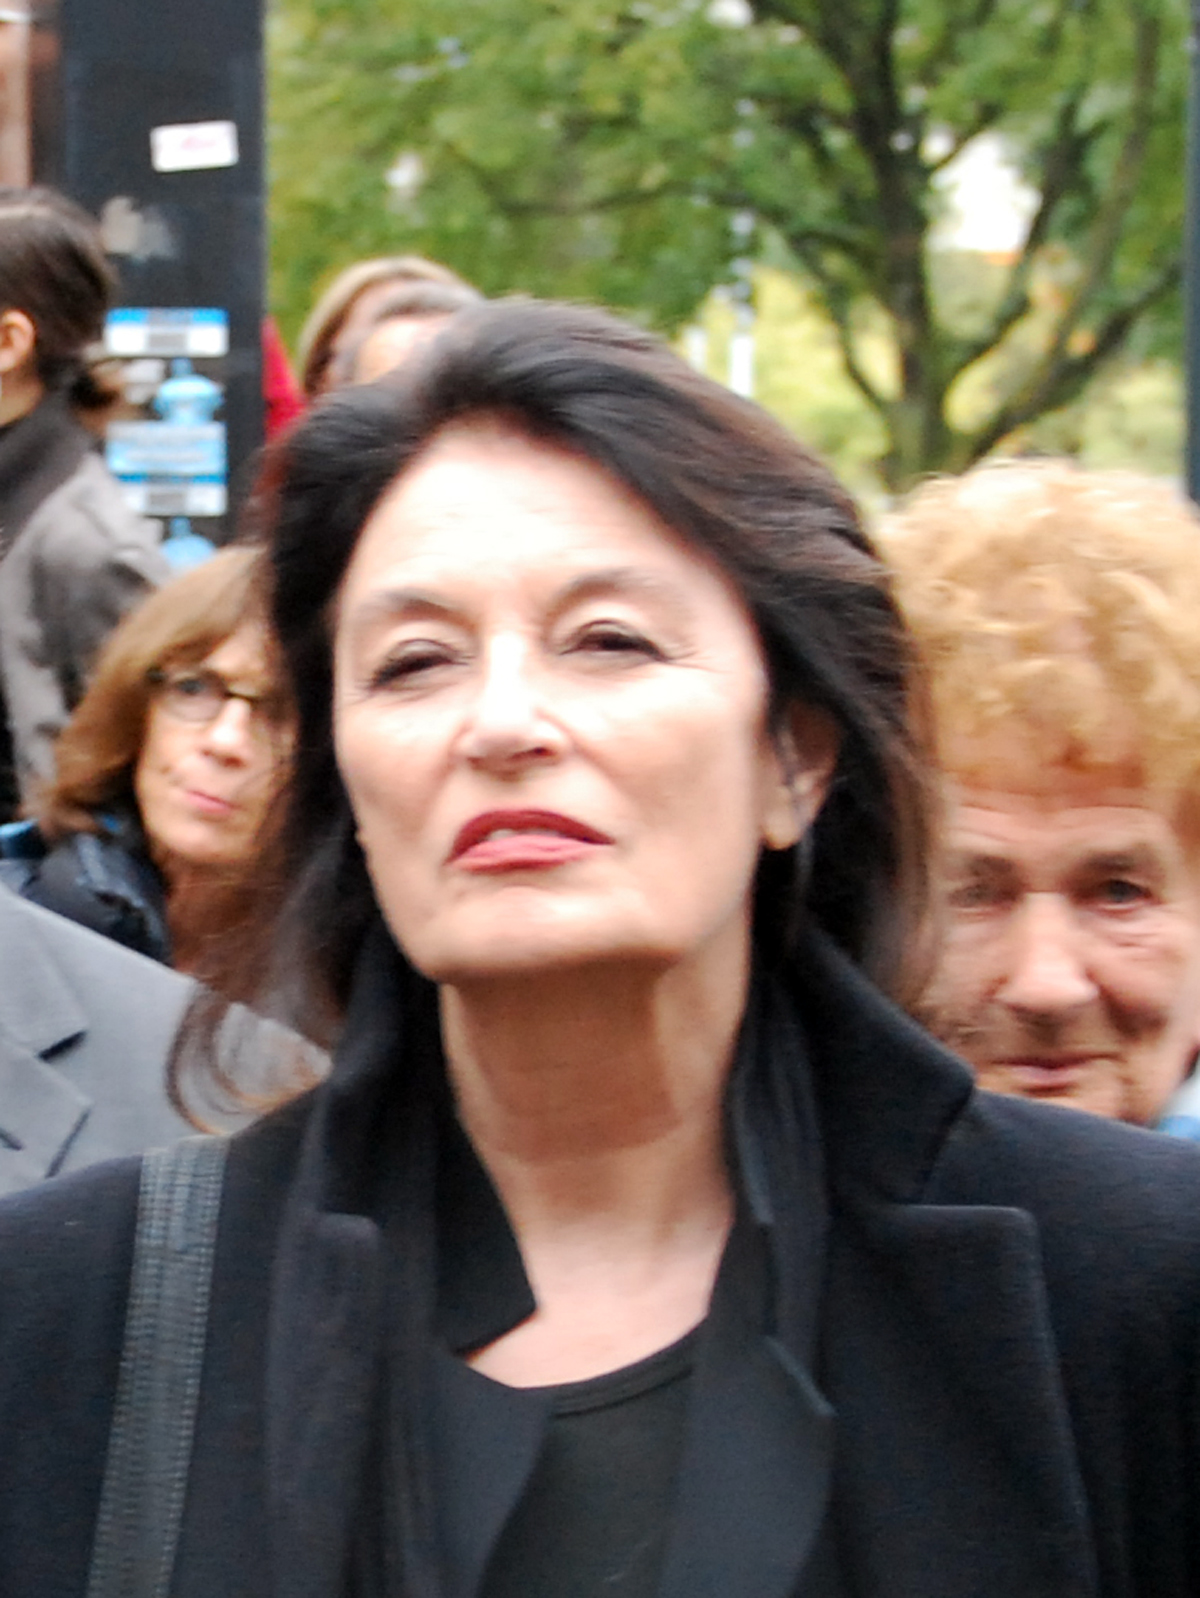 Anouk Aimée Photos file:anouk aim�e 2010 - wikimedia commons